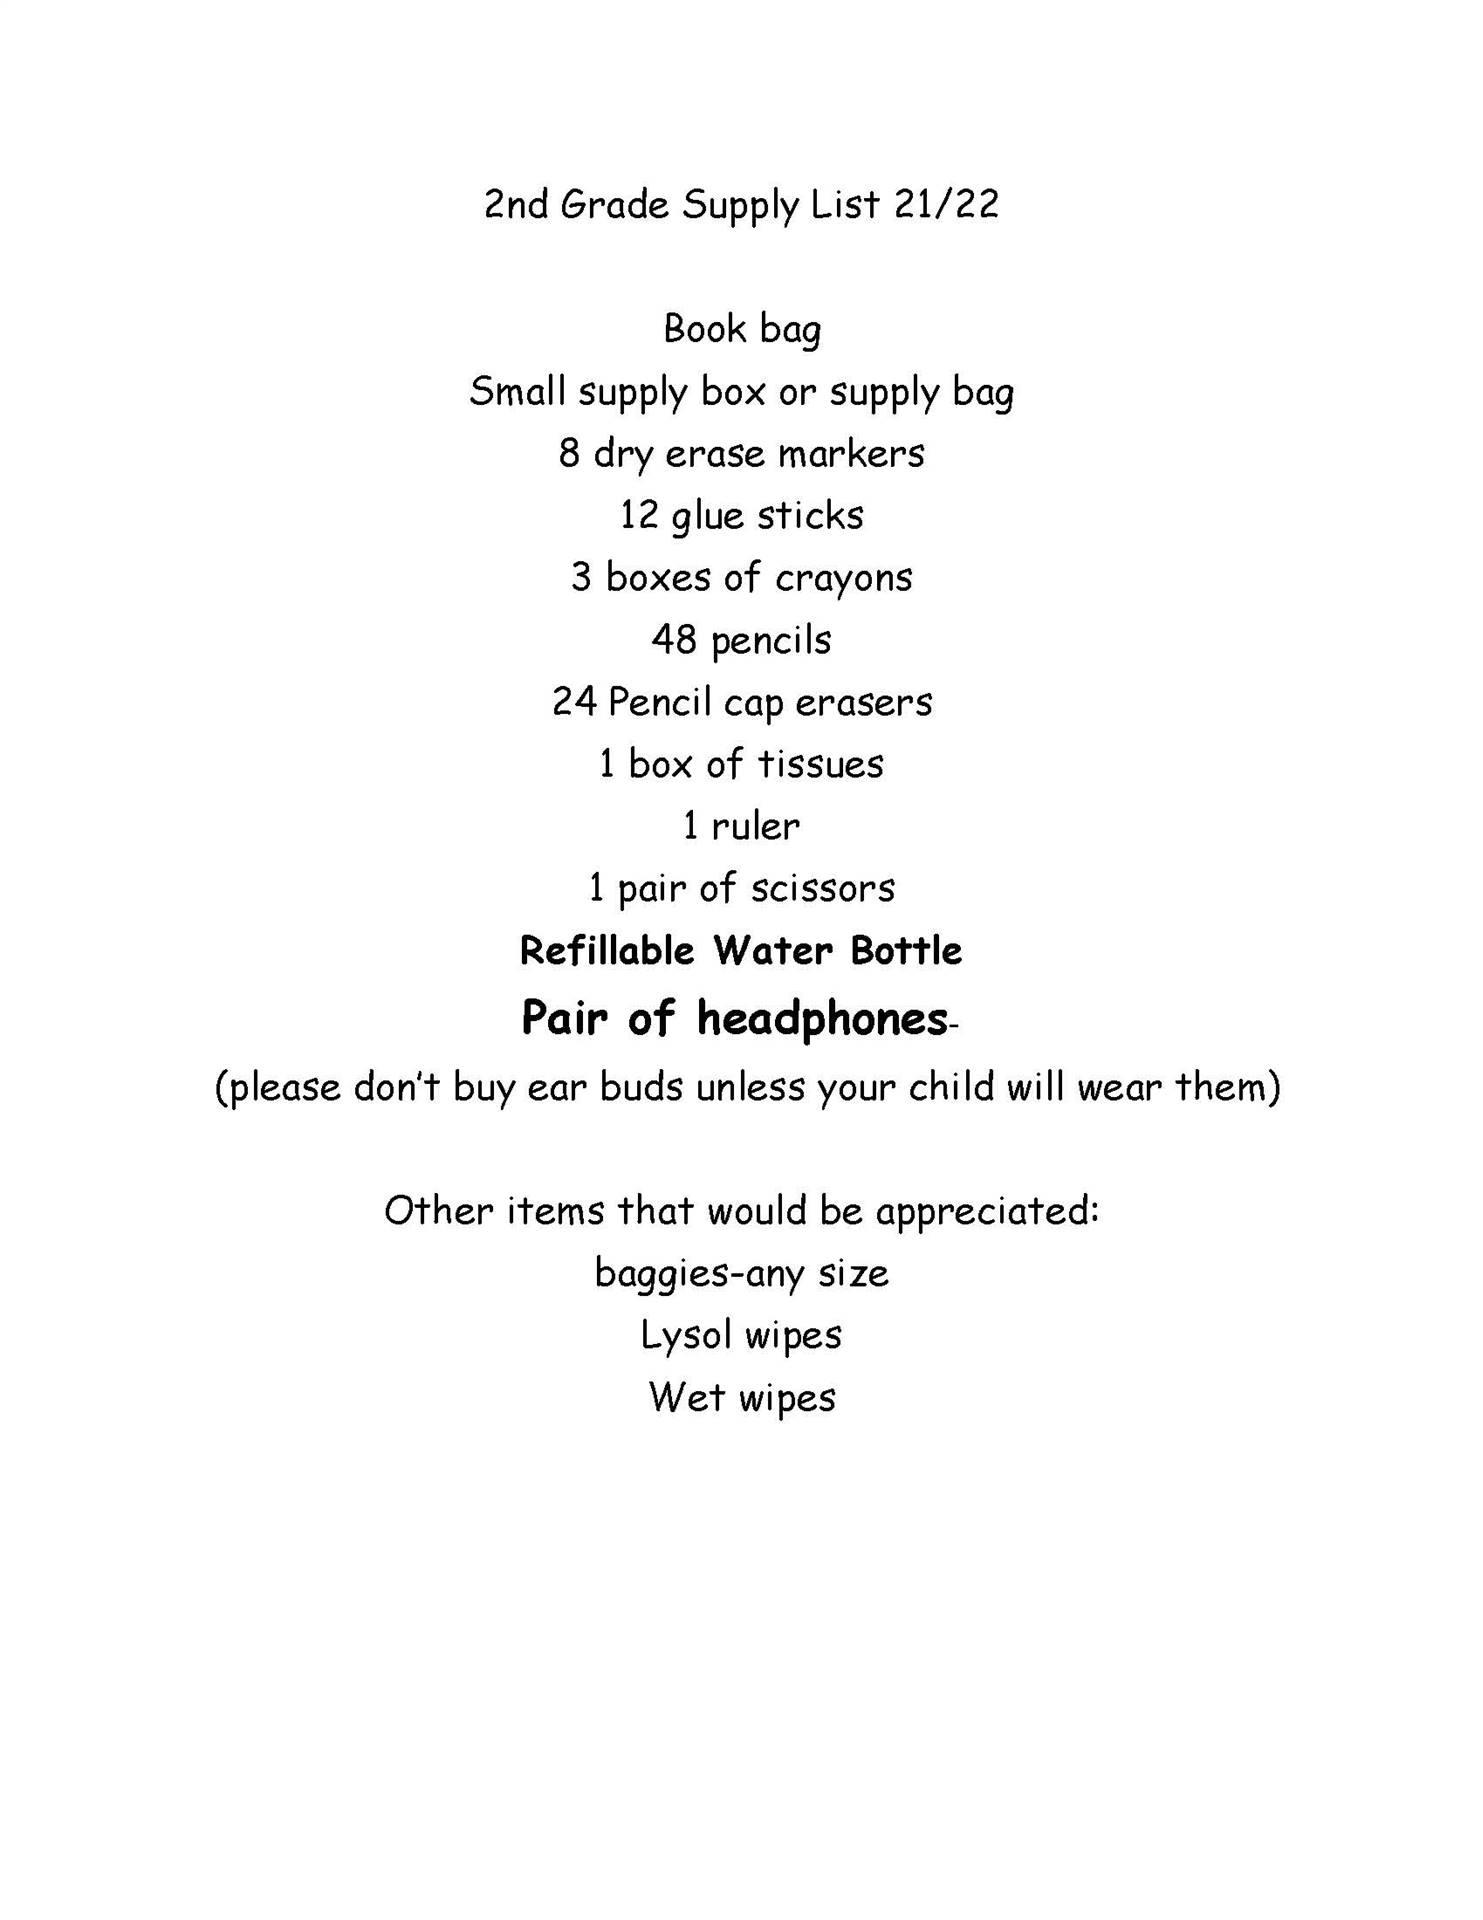 South - 2nd Grade Supply List